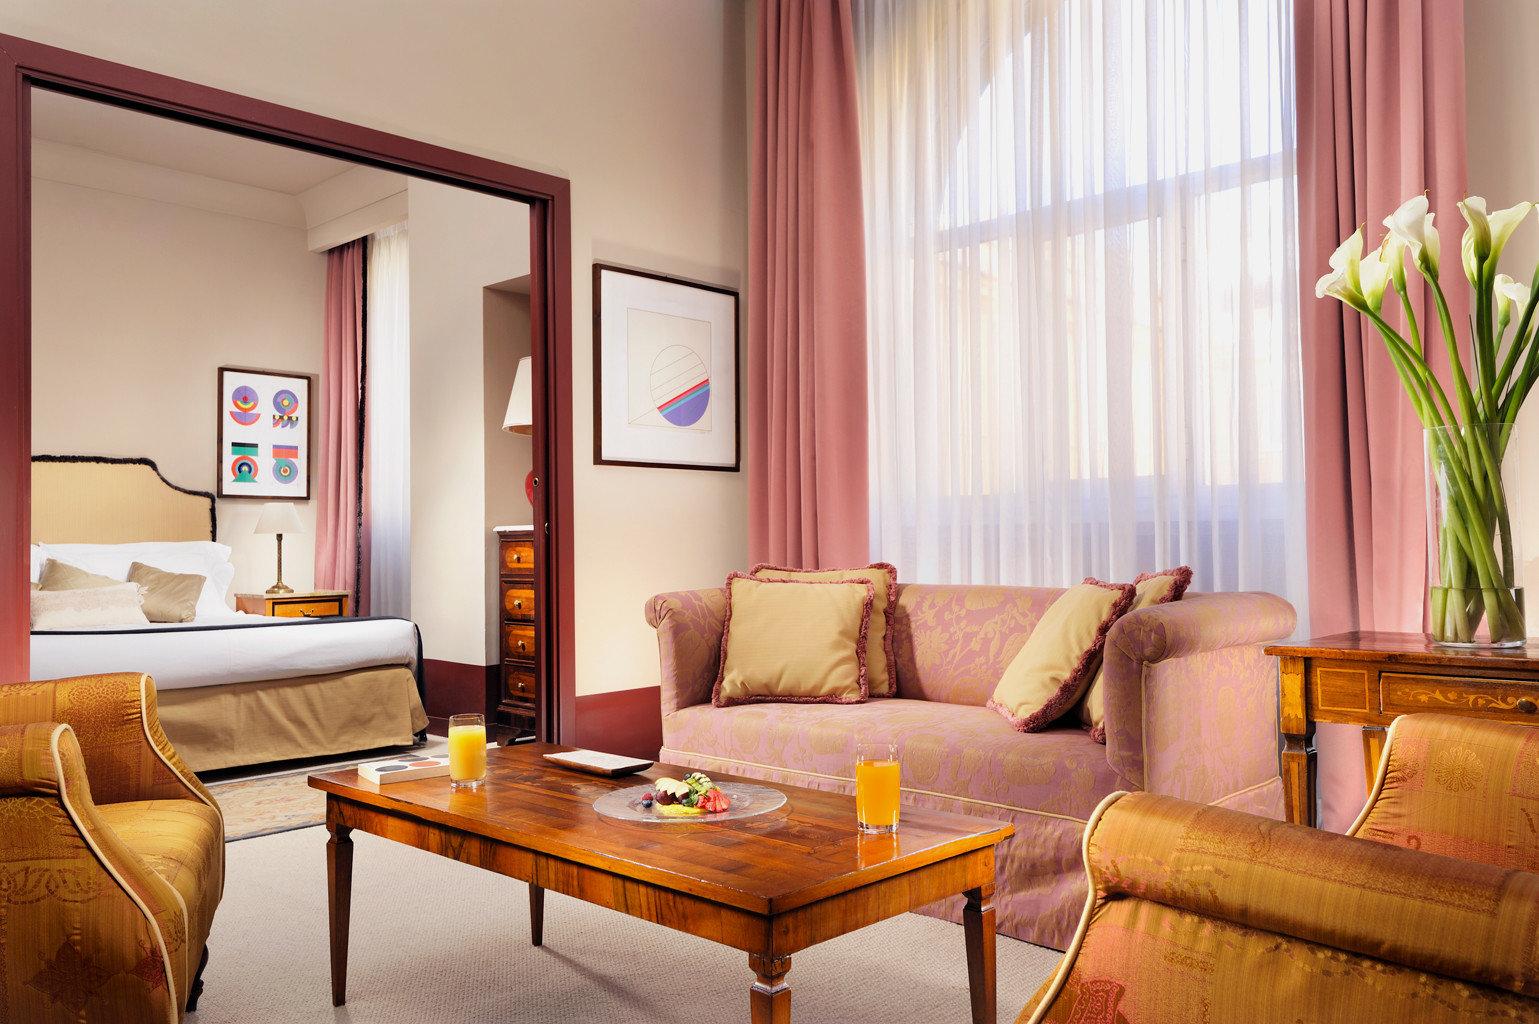 Bedroom Classic sofa property Suite living room home condominium Resort Villa cottage leather